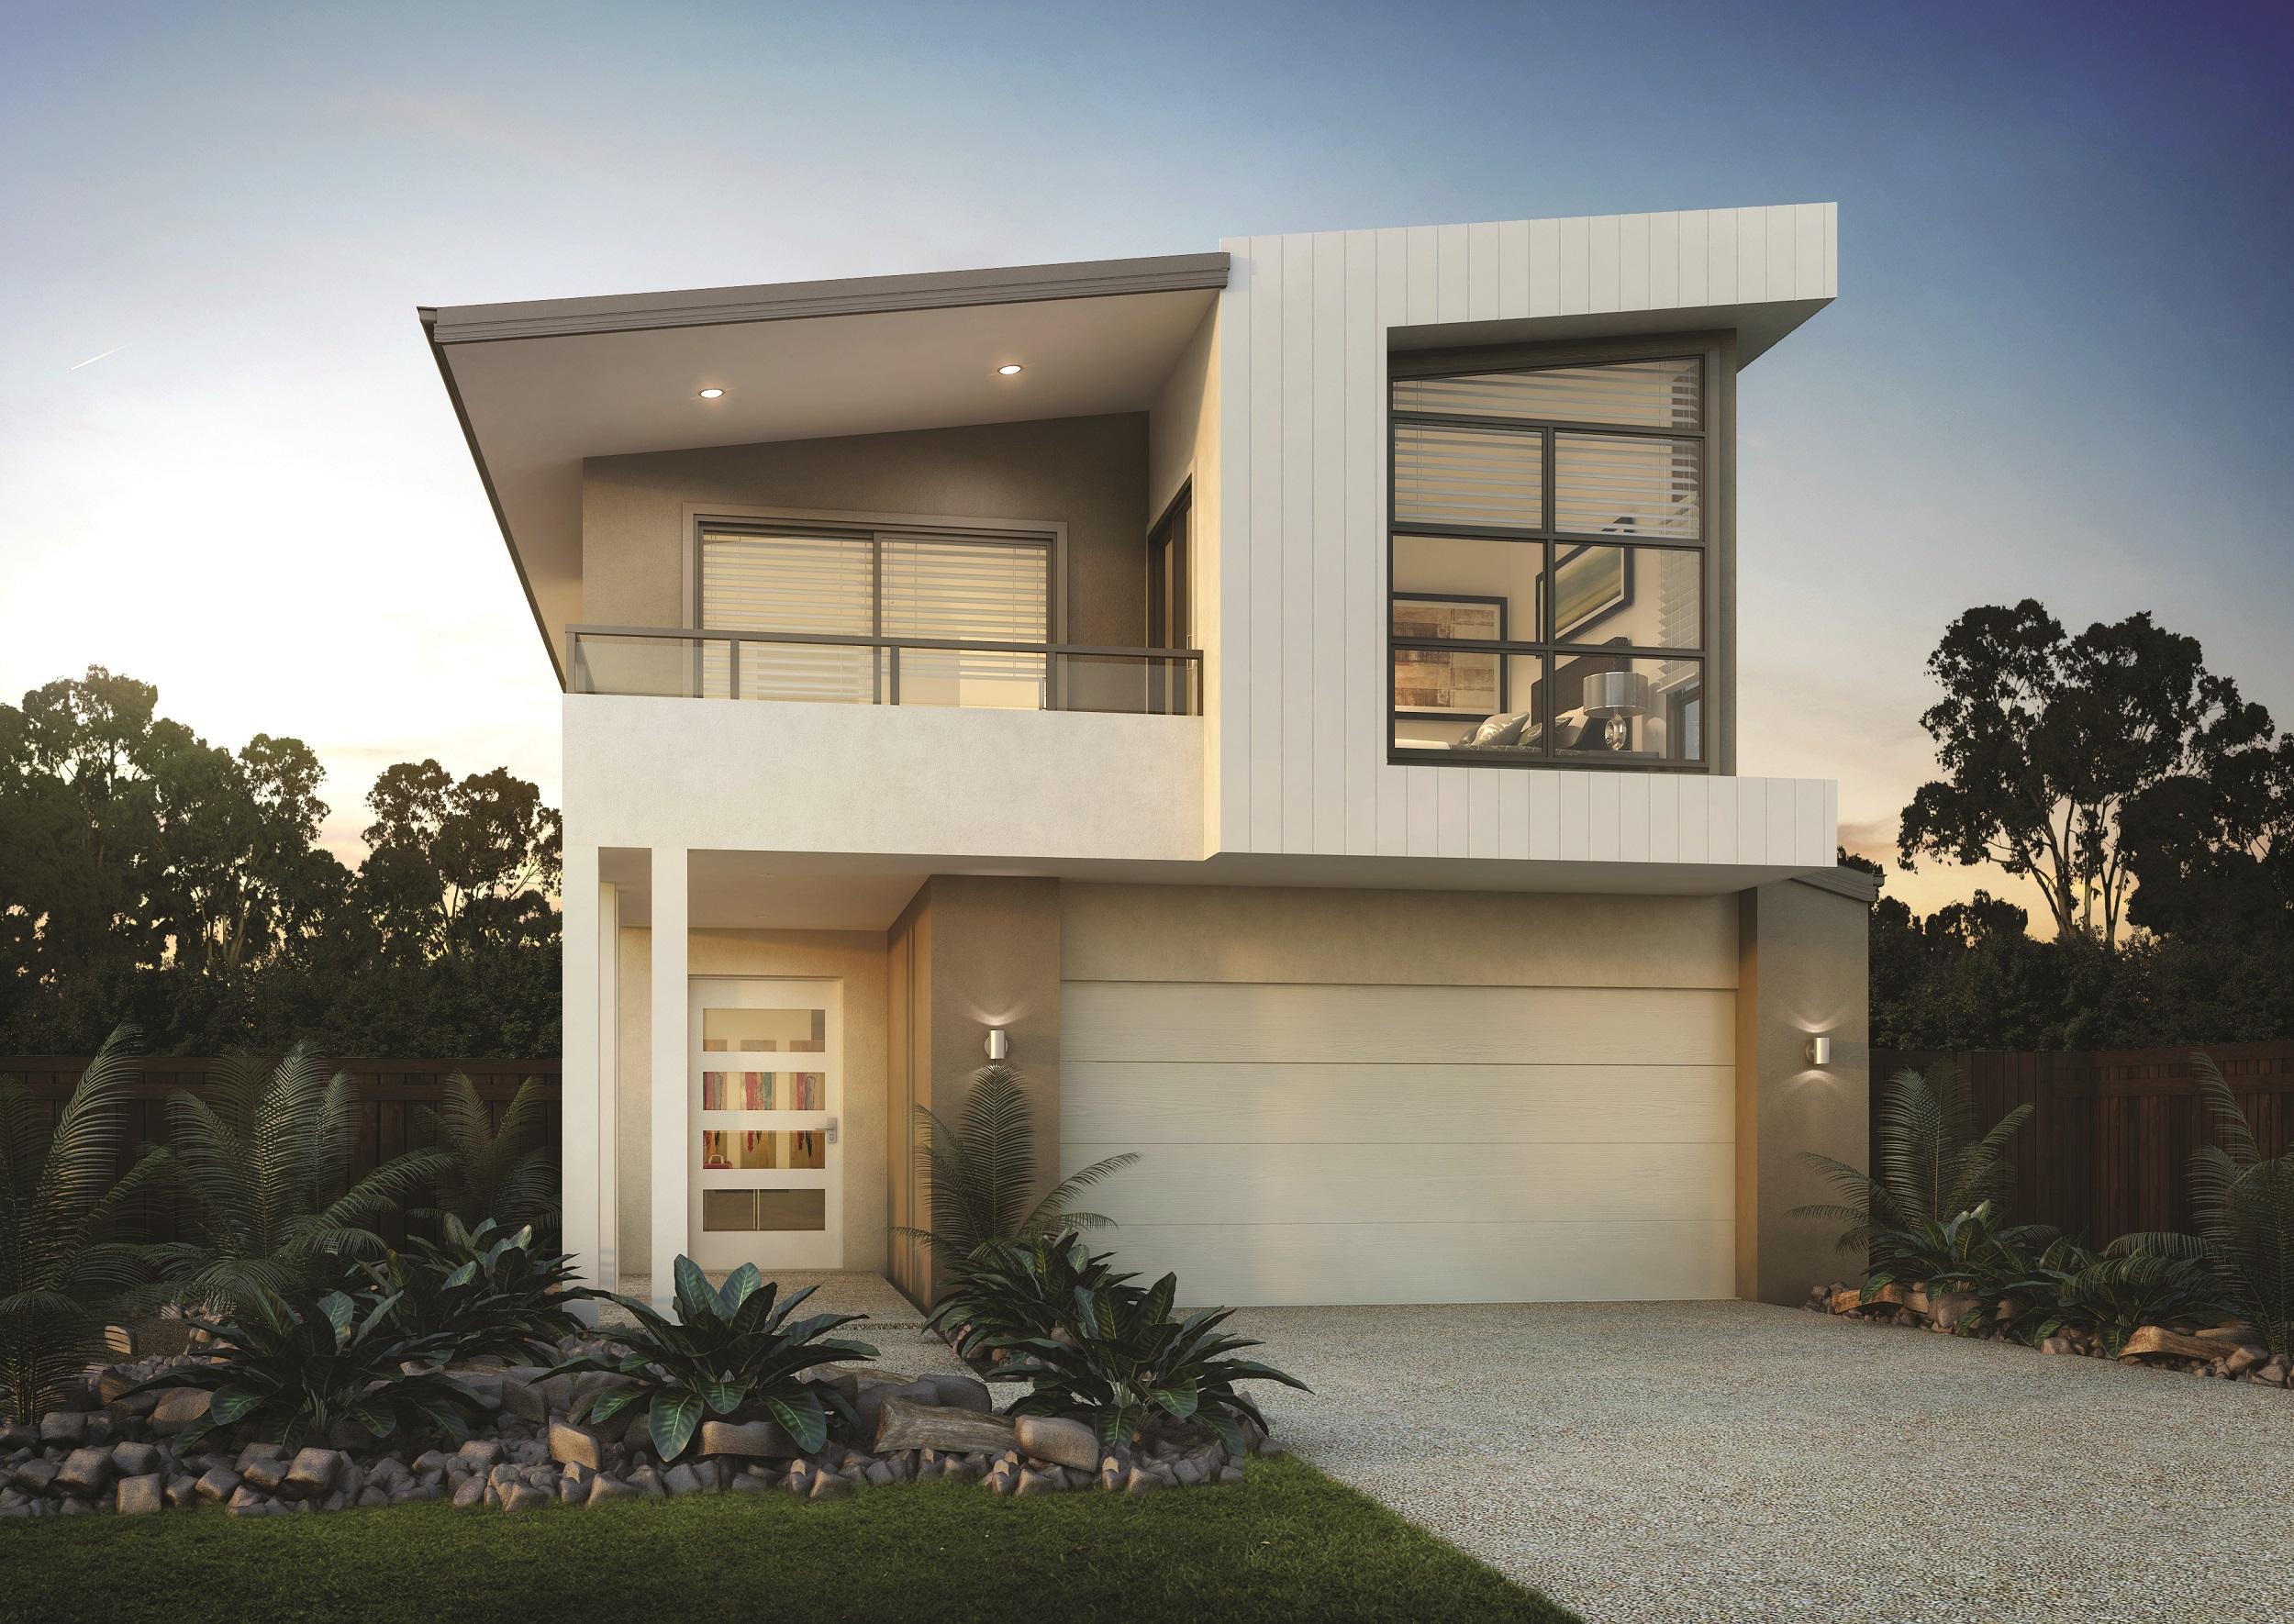 Image of Bentley facade